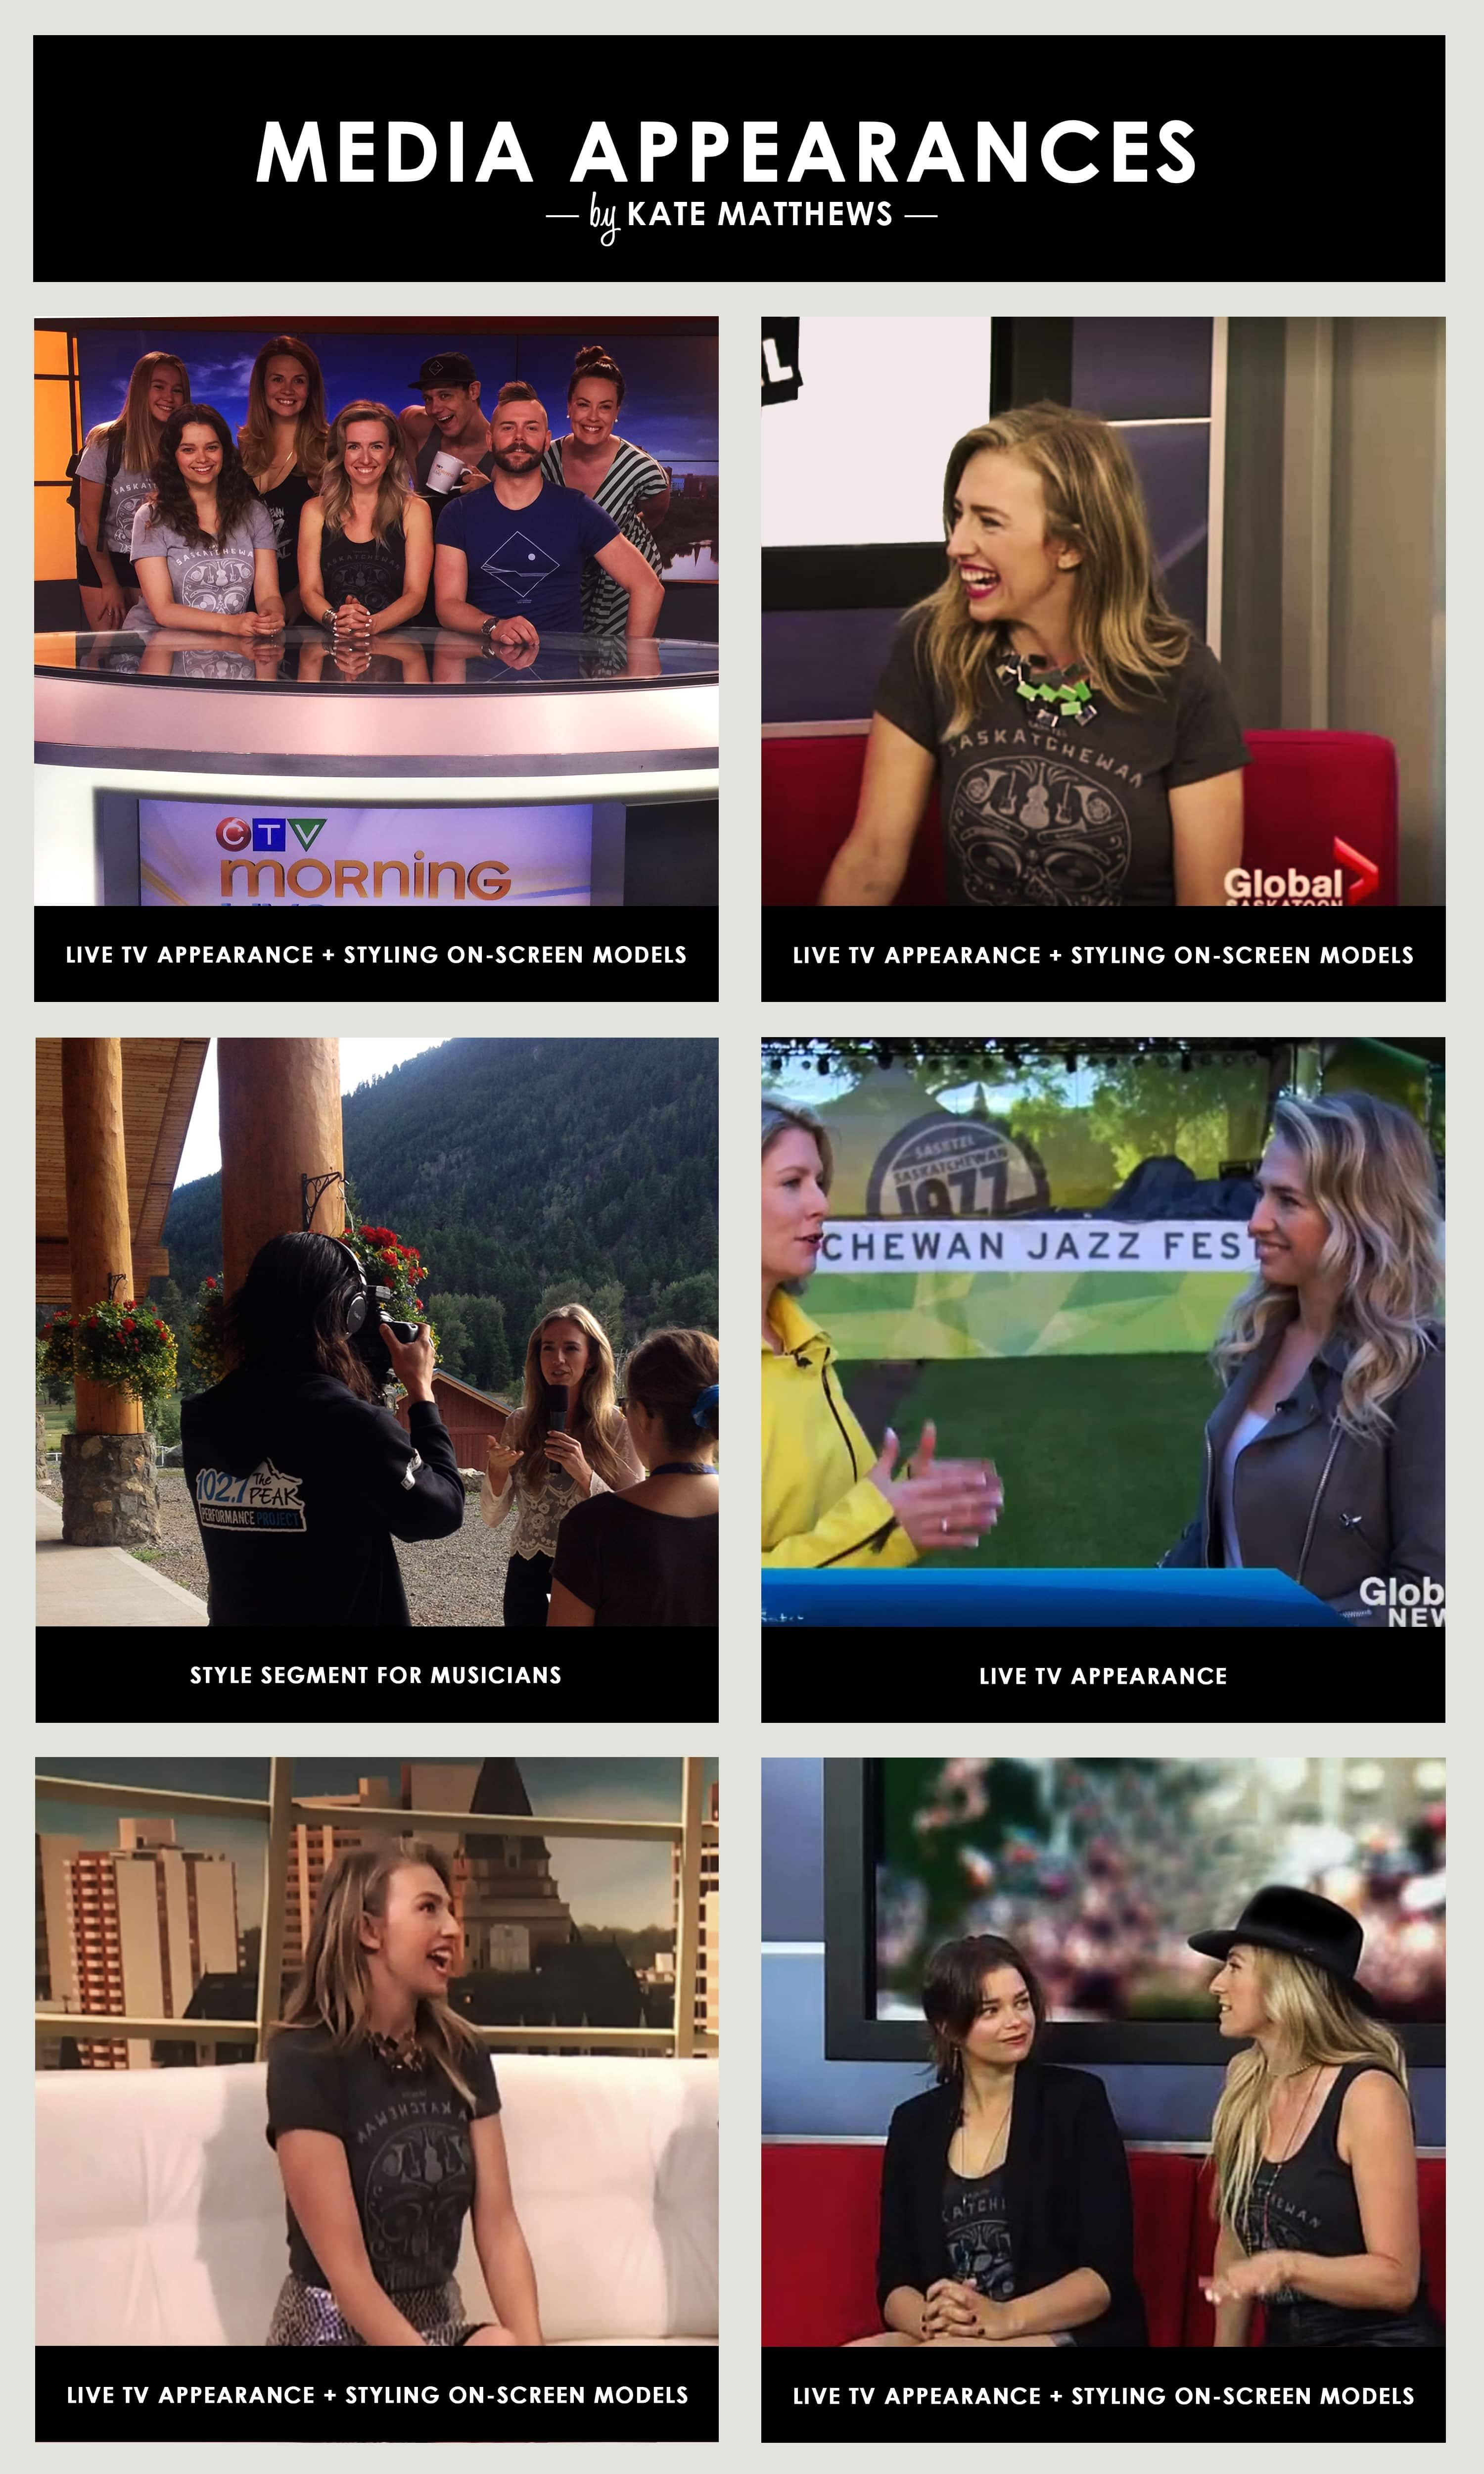 MEDIA-APPEARACNES-LIVE-TV-KATE-MATTHEWS-WARDROBE-STYLIST-FASHION